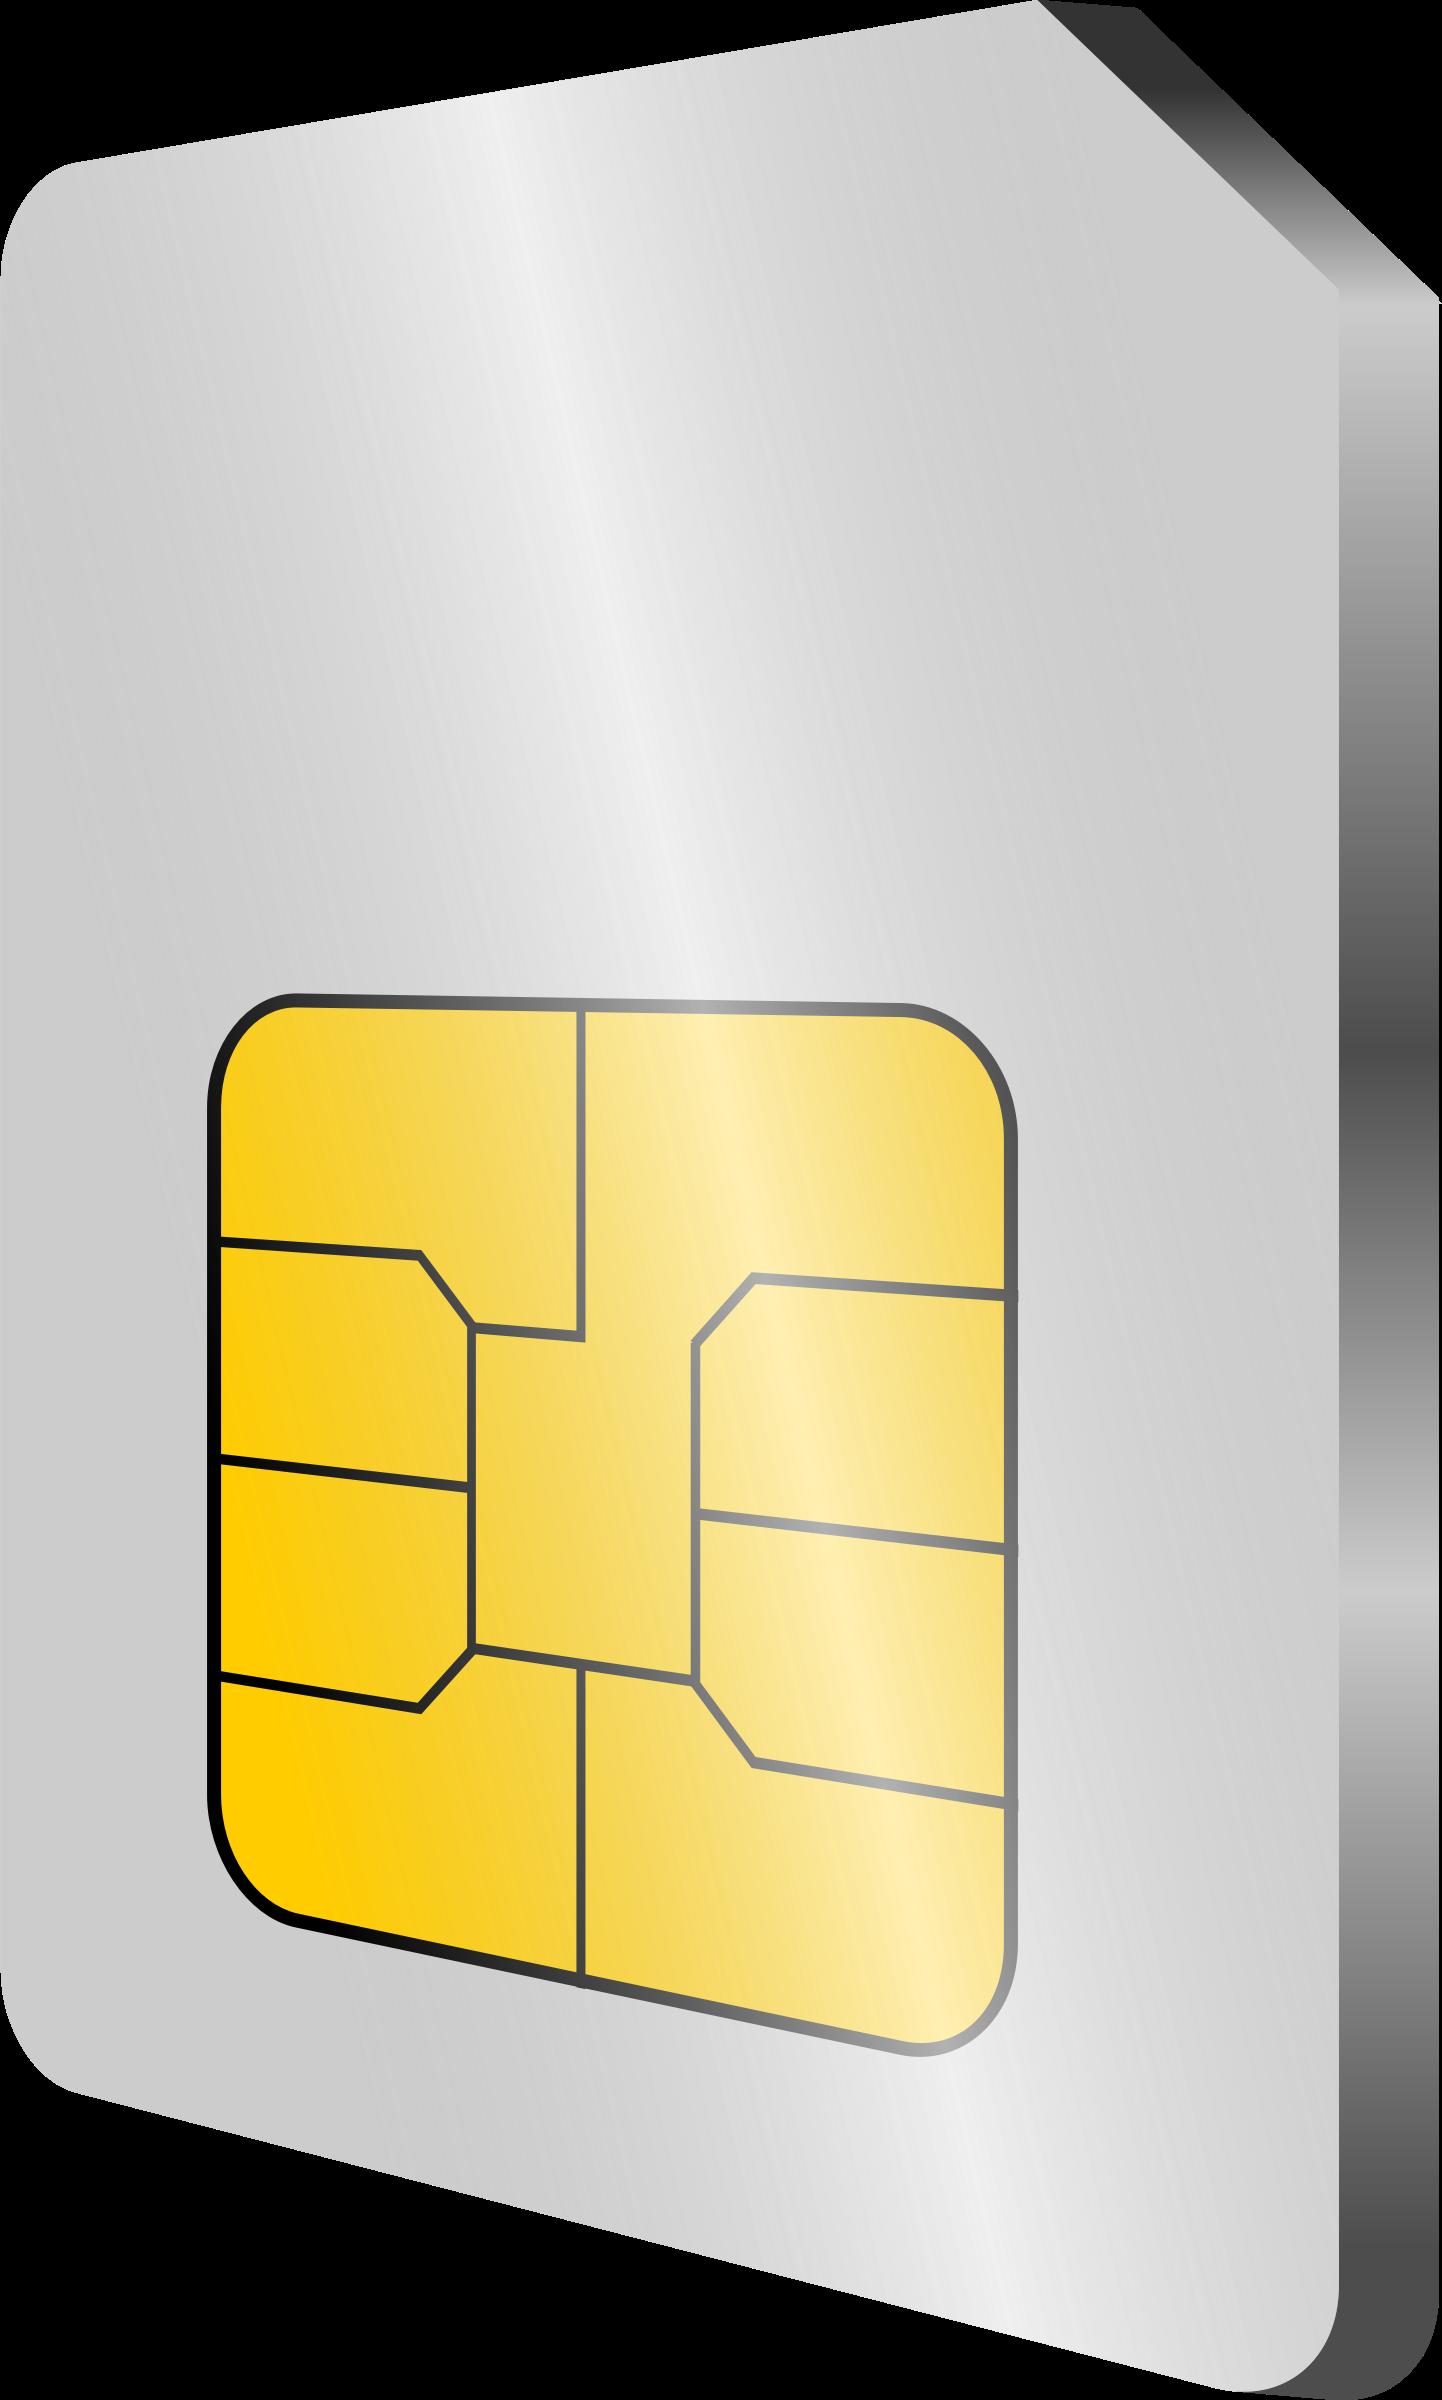 Sim Card Png Image Cards Sims Credit Card Multi Tool